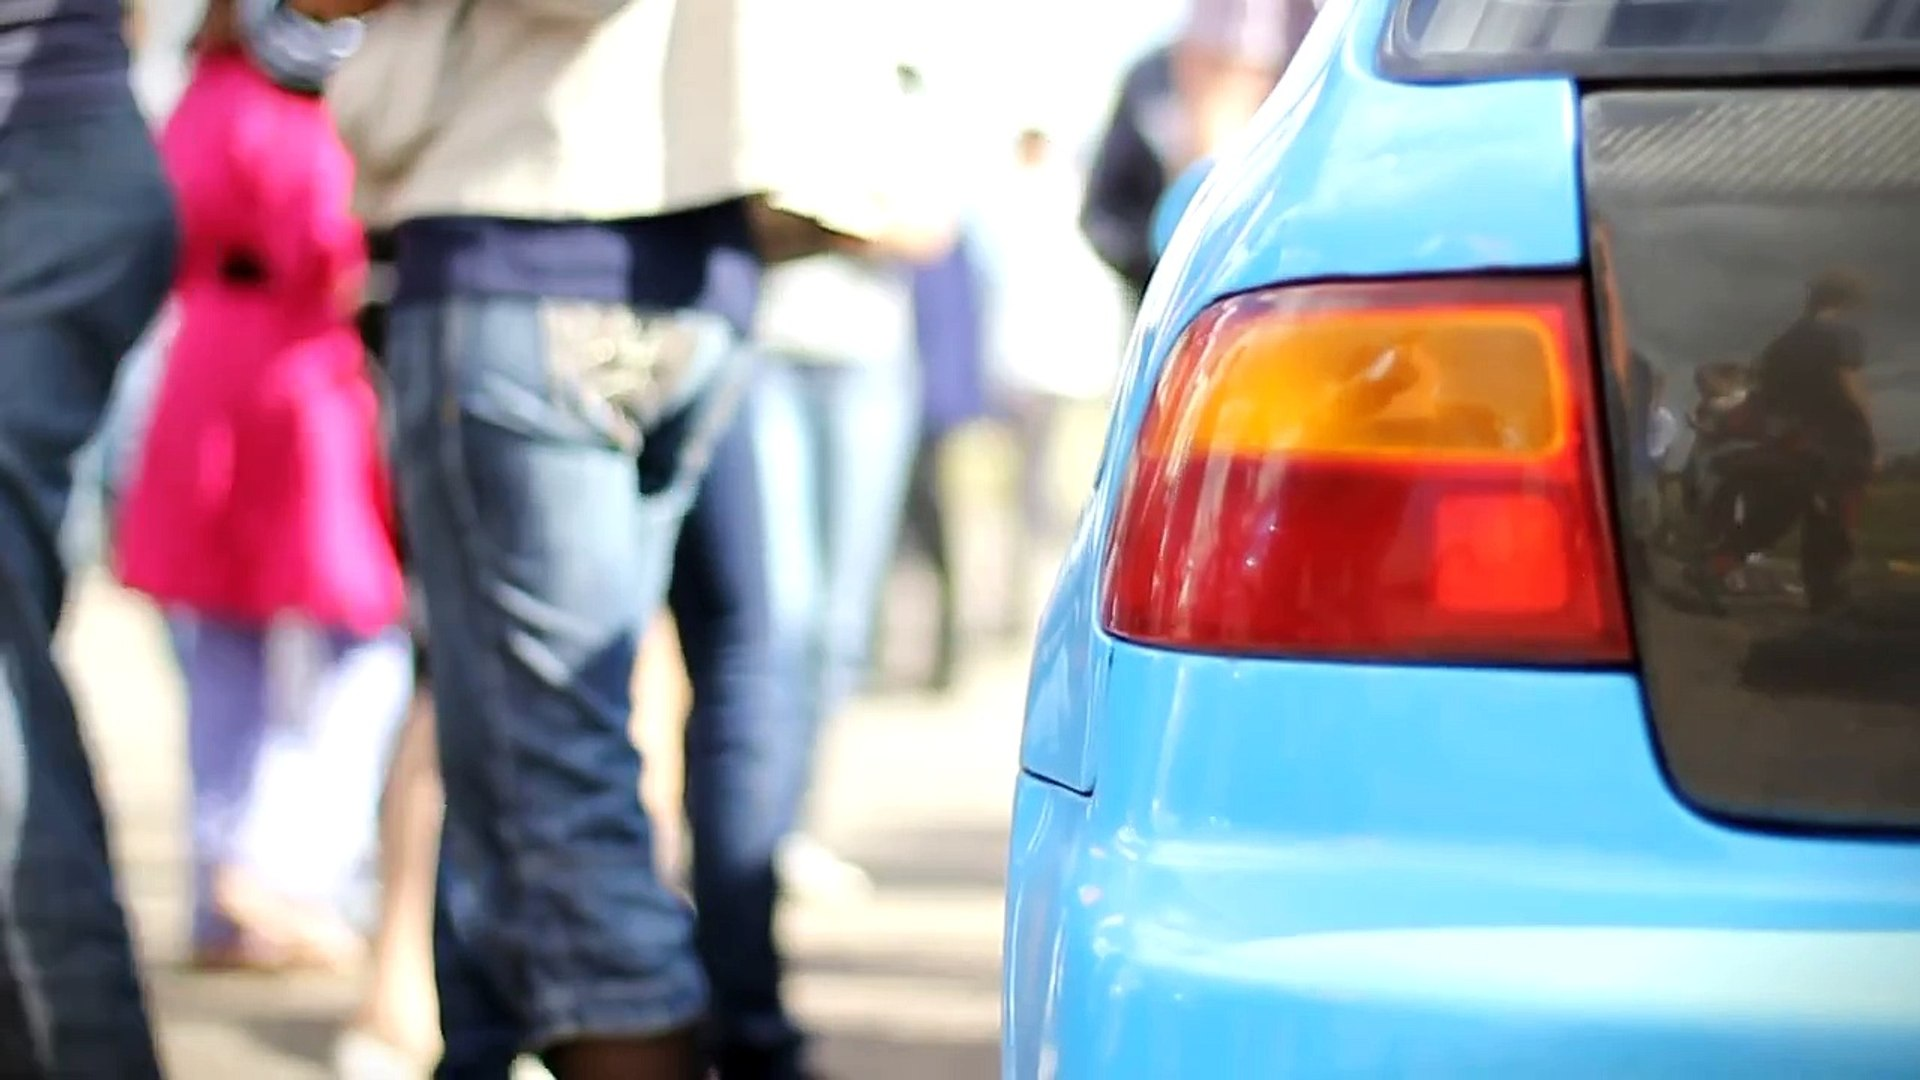 Honda Civic Turbo vs Тазы :) г. Октябрьский 27.08.2011 г.